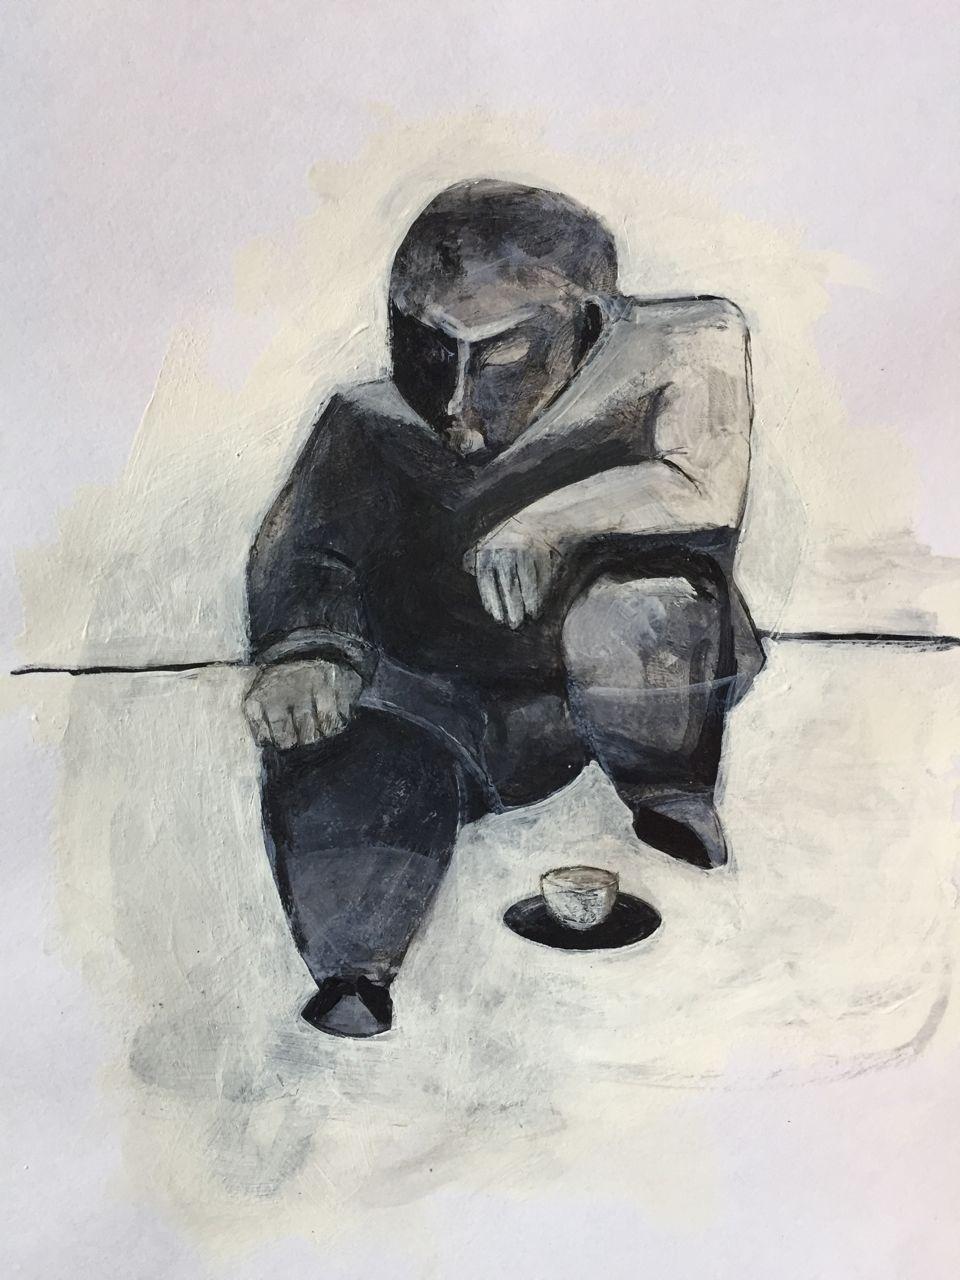 Man with teacup